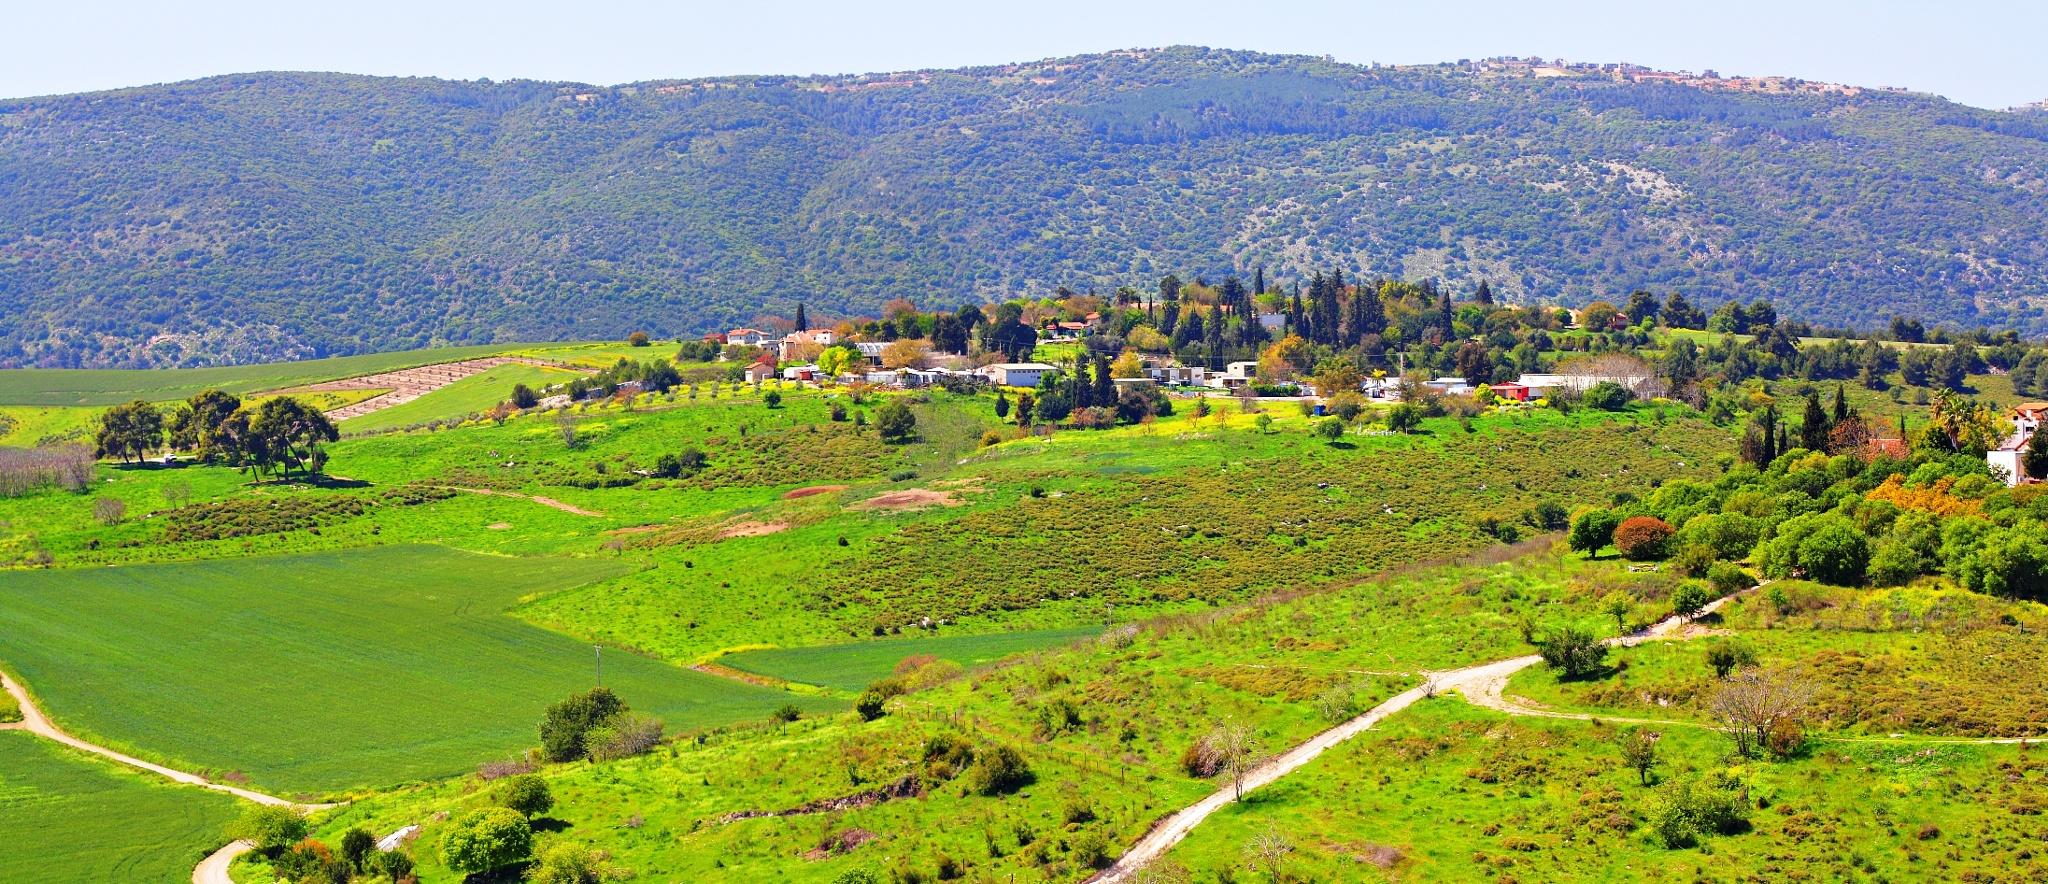 Lower Galilee.Kiryat Tiv'on.Israel by Konstantin Bolotinsky